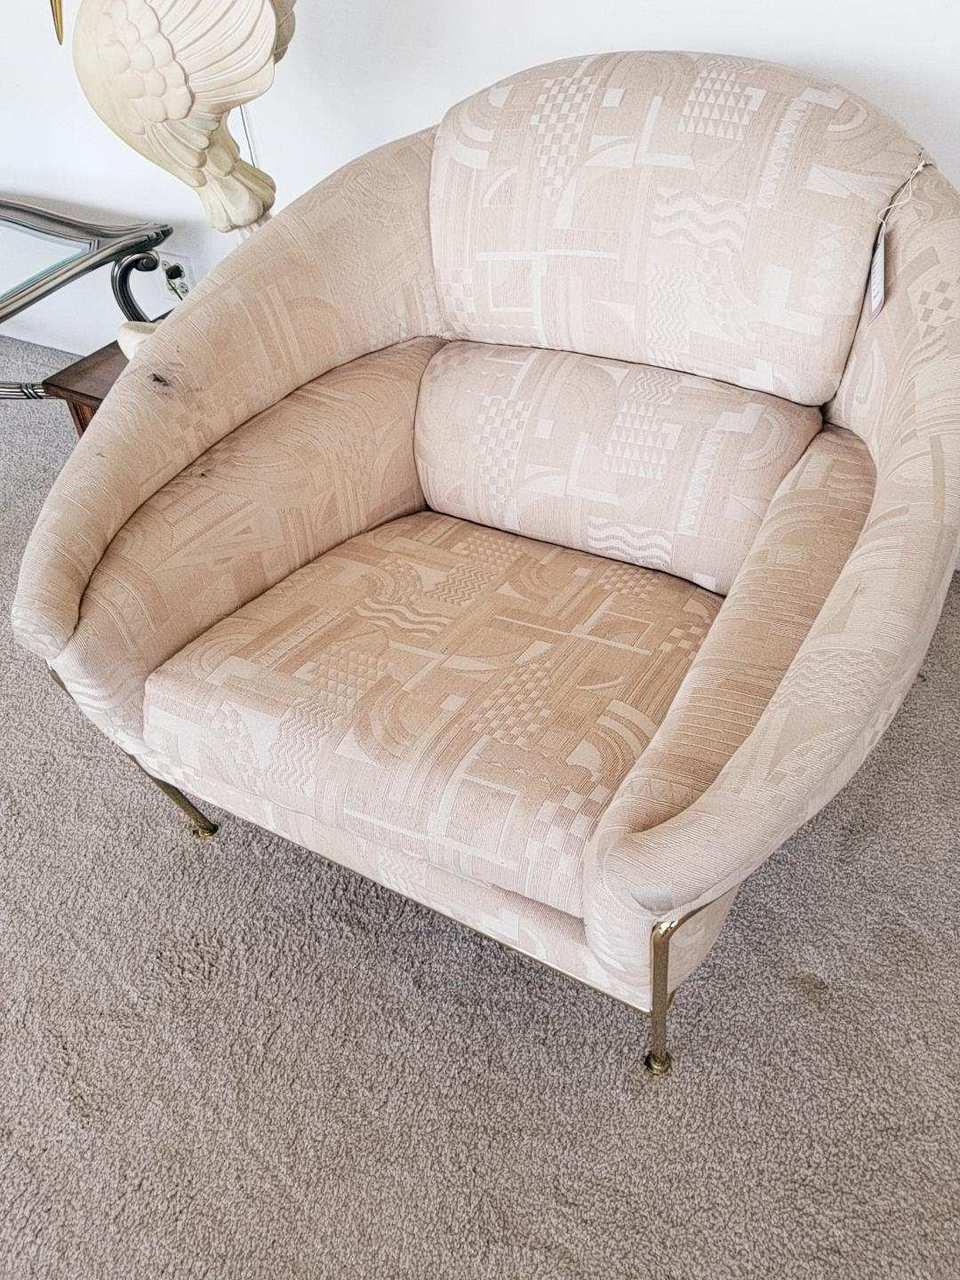 Vintage Showroom Floor Rare Brass Legged Milo Baughman Boldido Chair